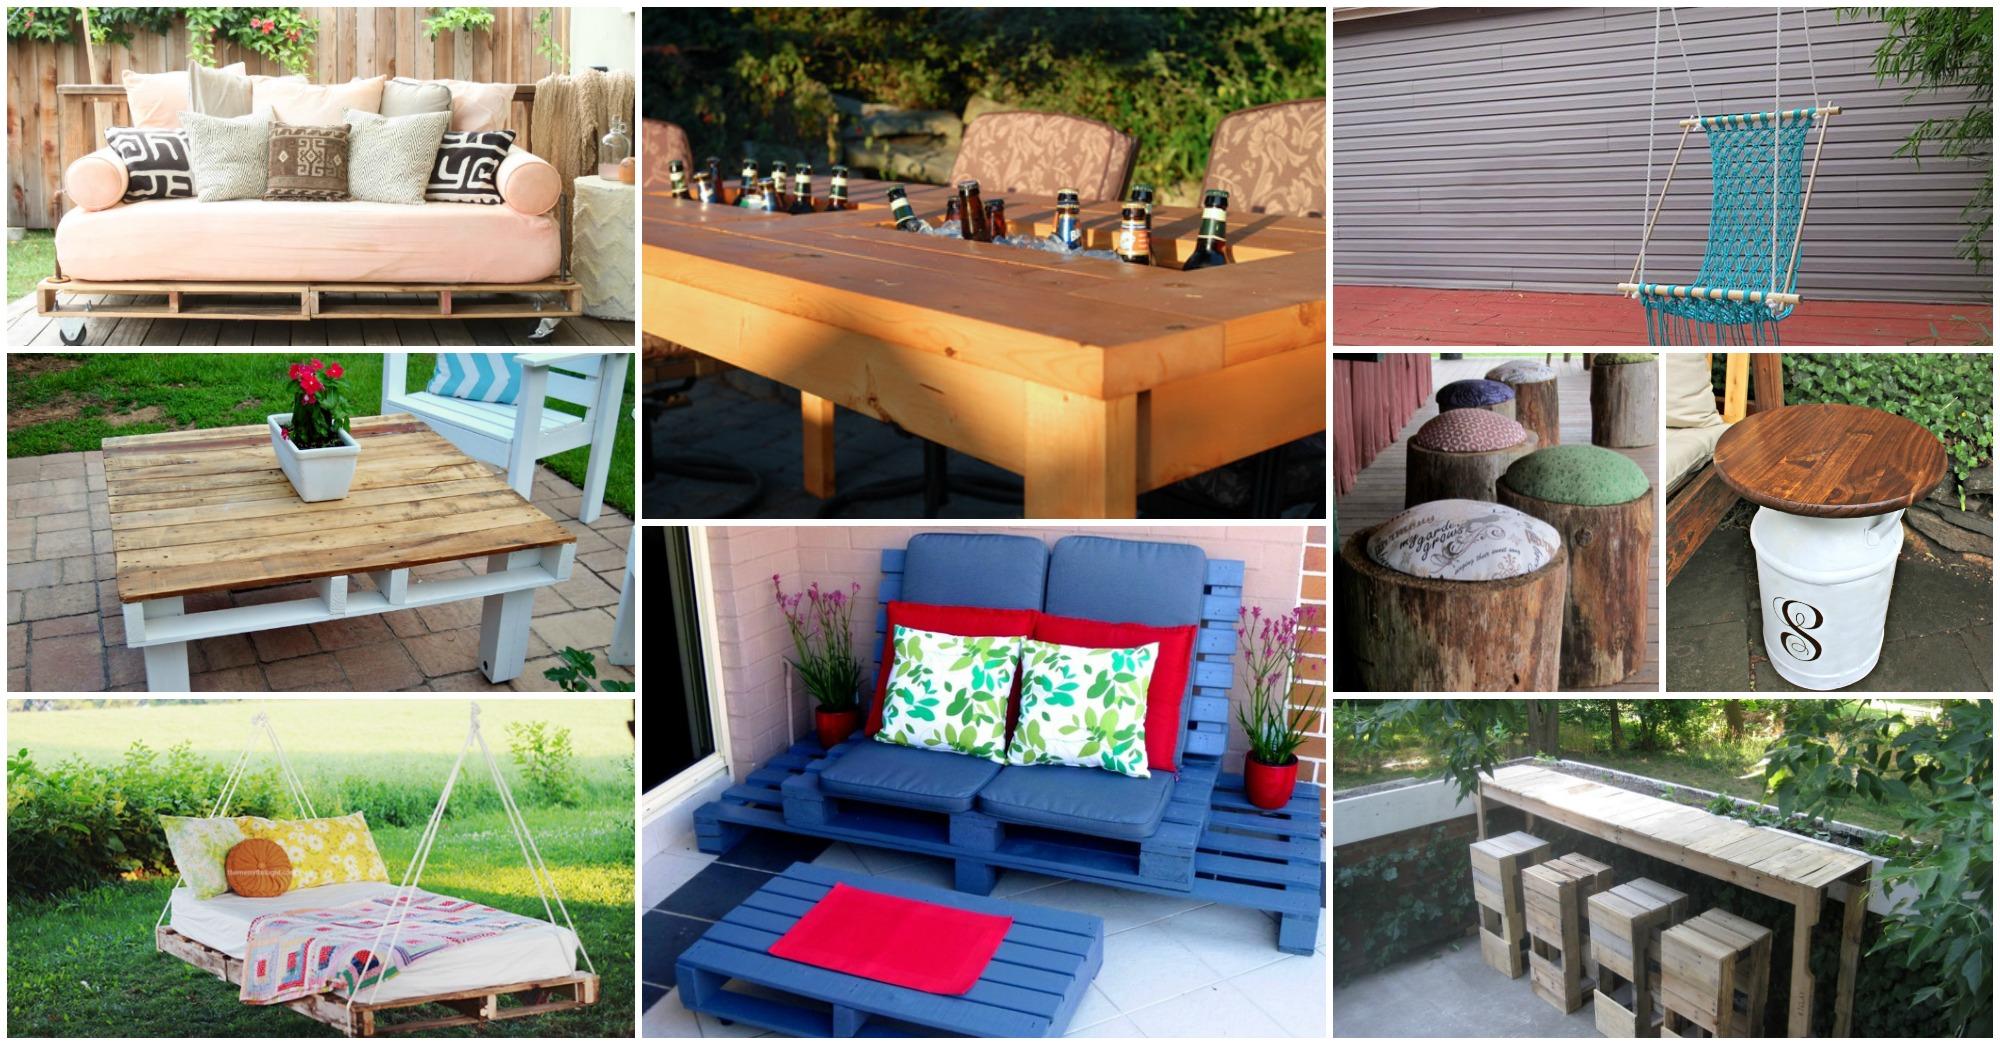 16 Budget Friendly DIY Backyard Furniture Ideas You Need